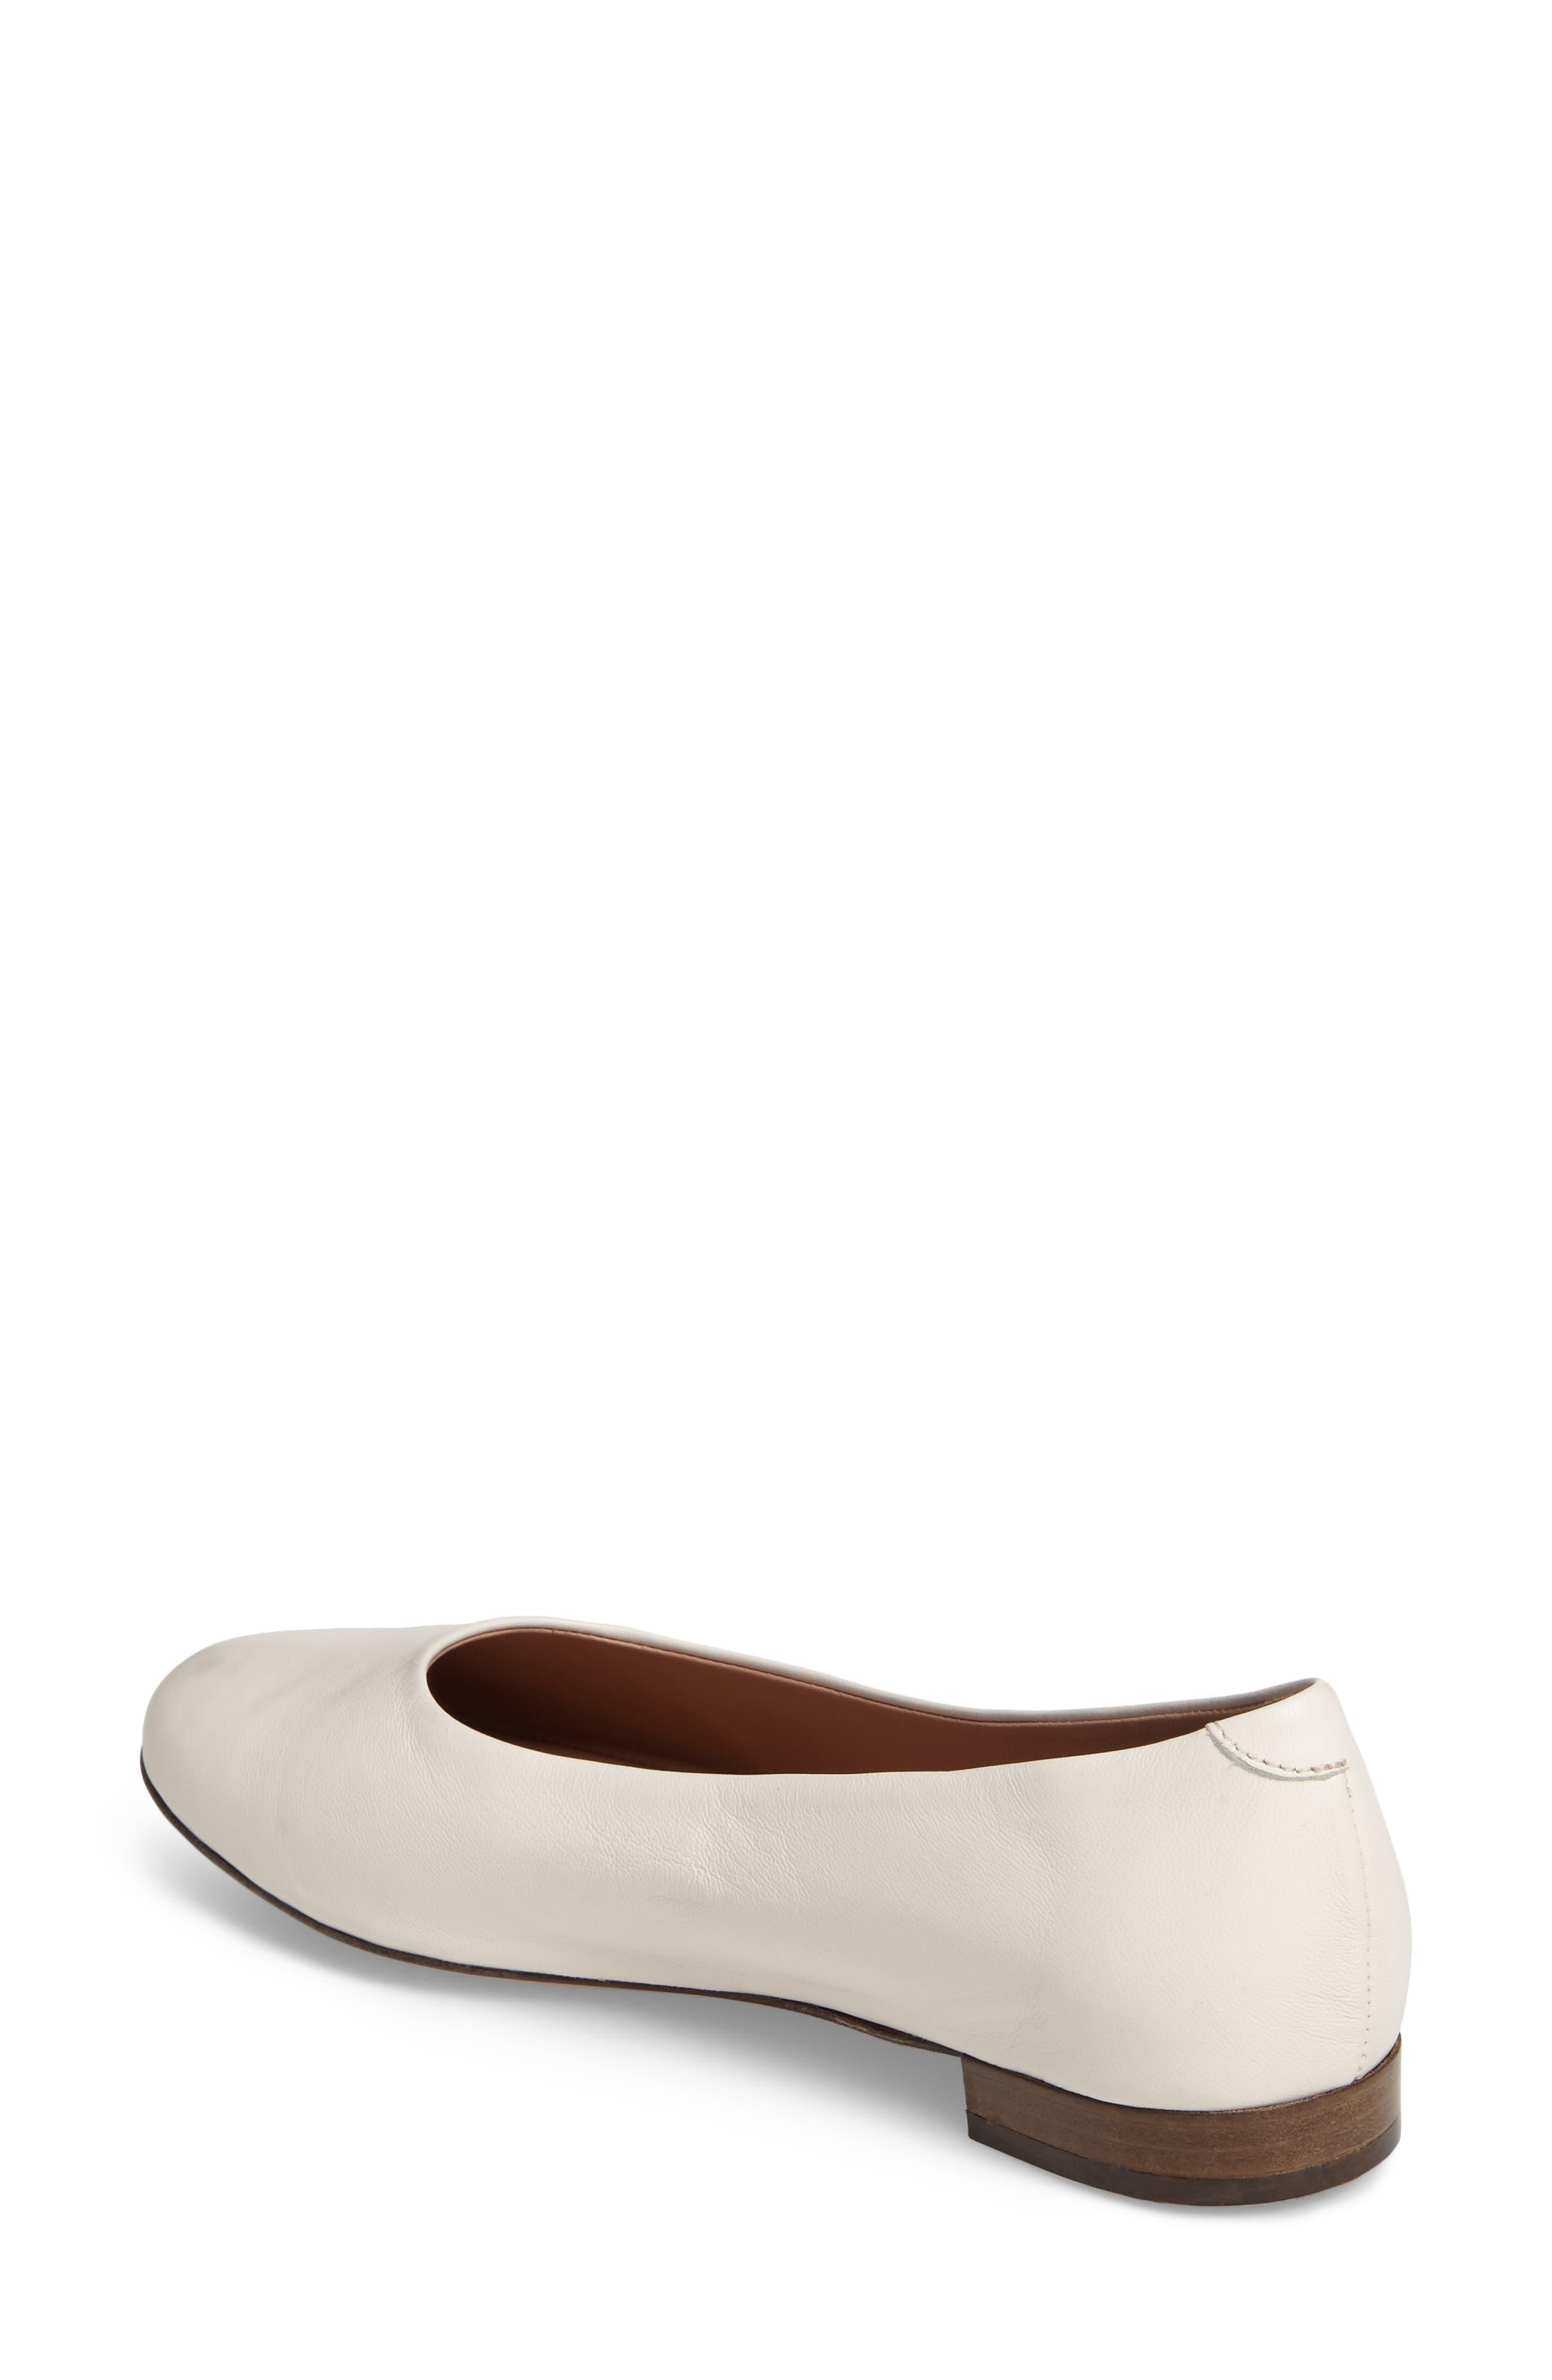 Gemma Ballerina Flat,                             Alternate thumbnail 3, color,                             Bone Leather